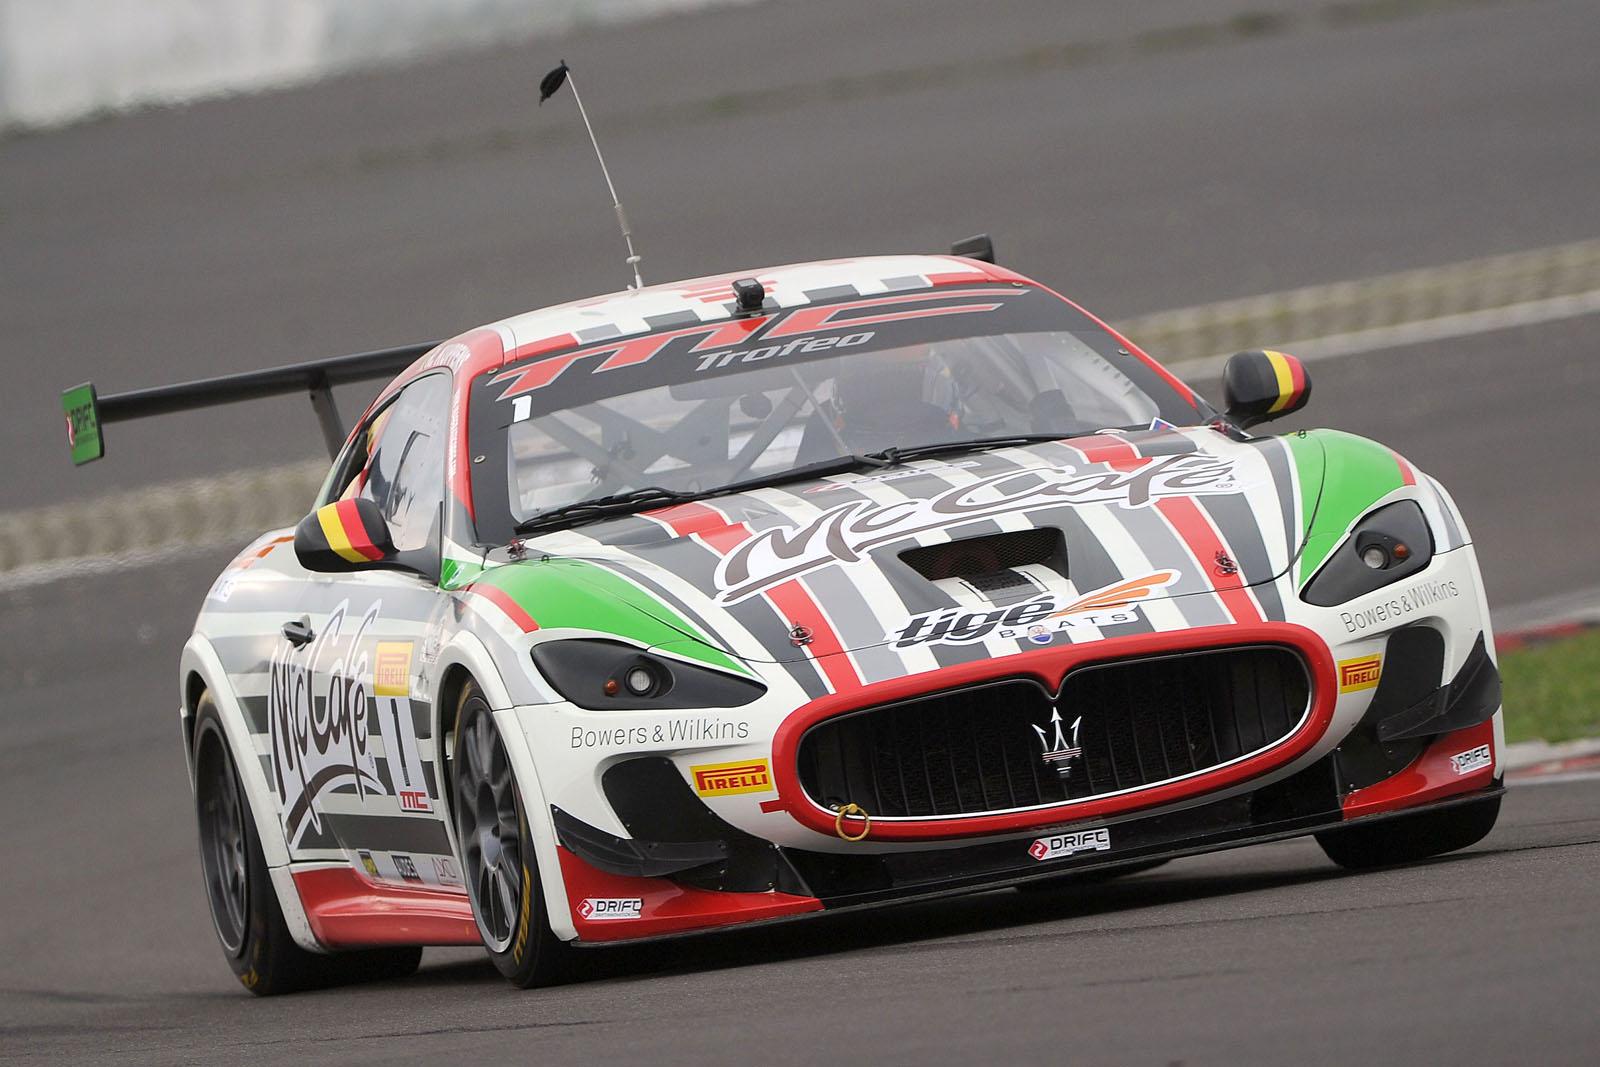 kuppens wins maserati trofeo mc world series at nurburgring - gtspirit